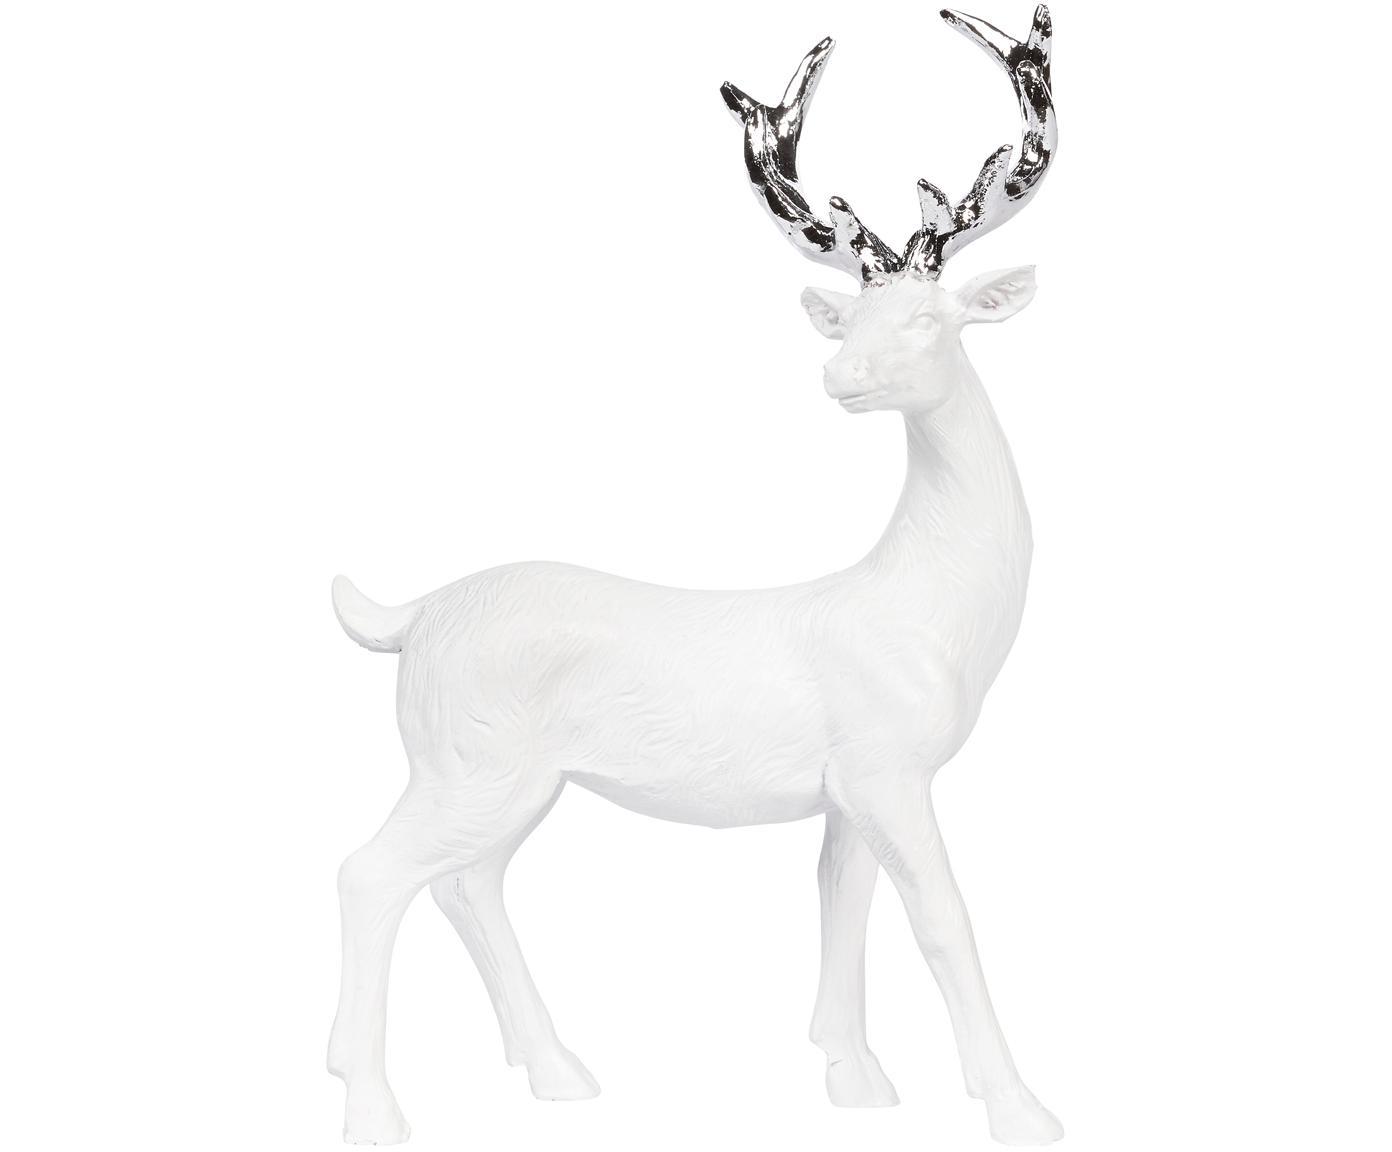 Oggetto decorativo fatto a mano Deer, Poliresina, Bianco, argentato, Larg. 9 x Alt. 14 cm